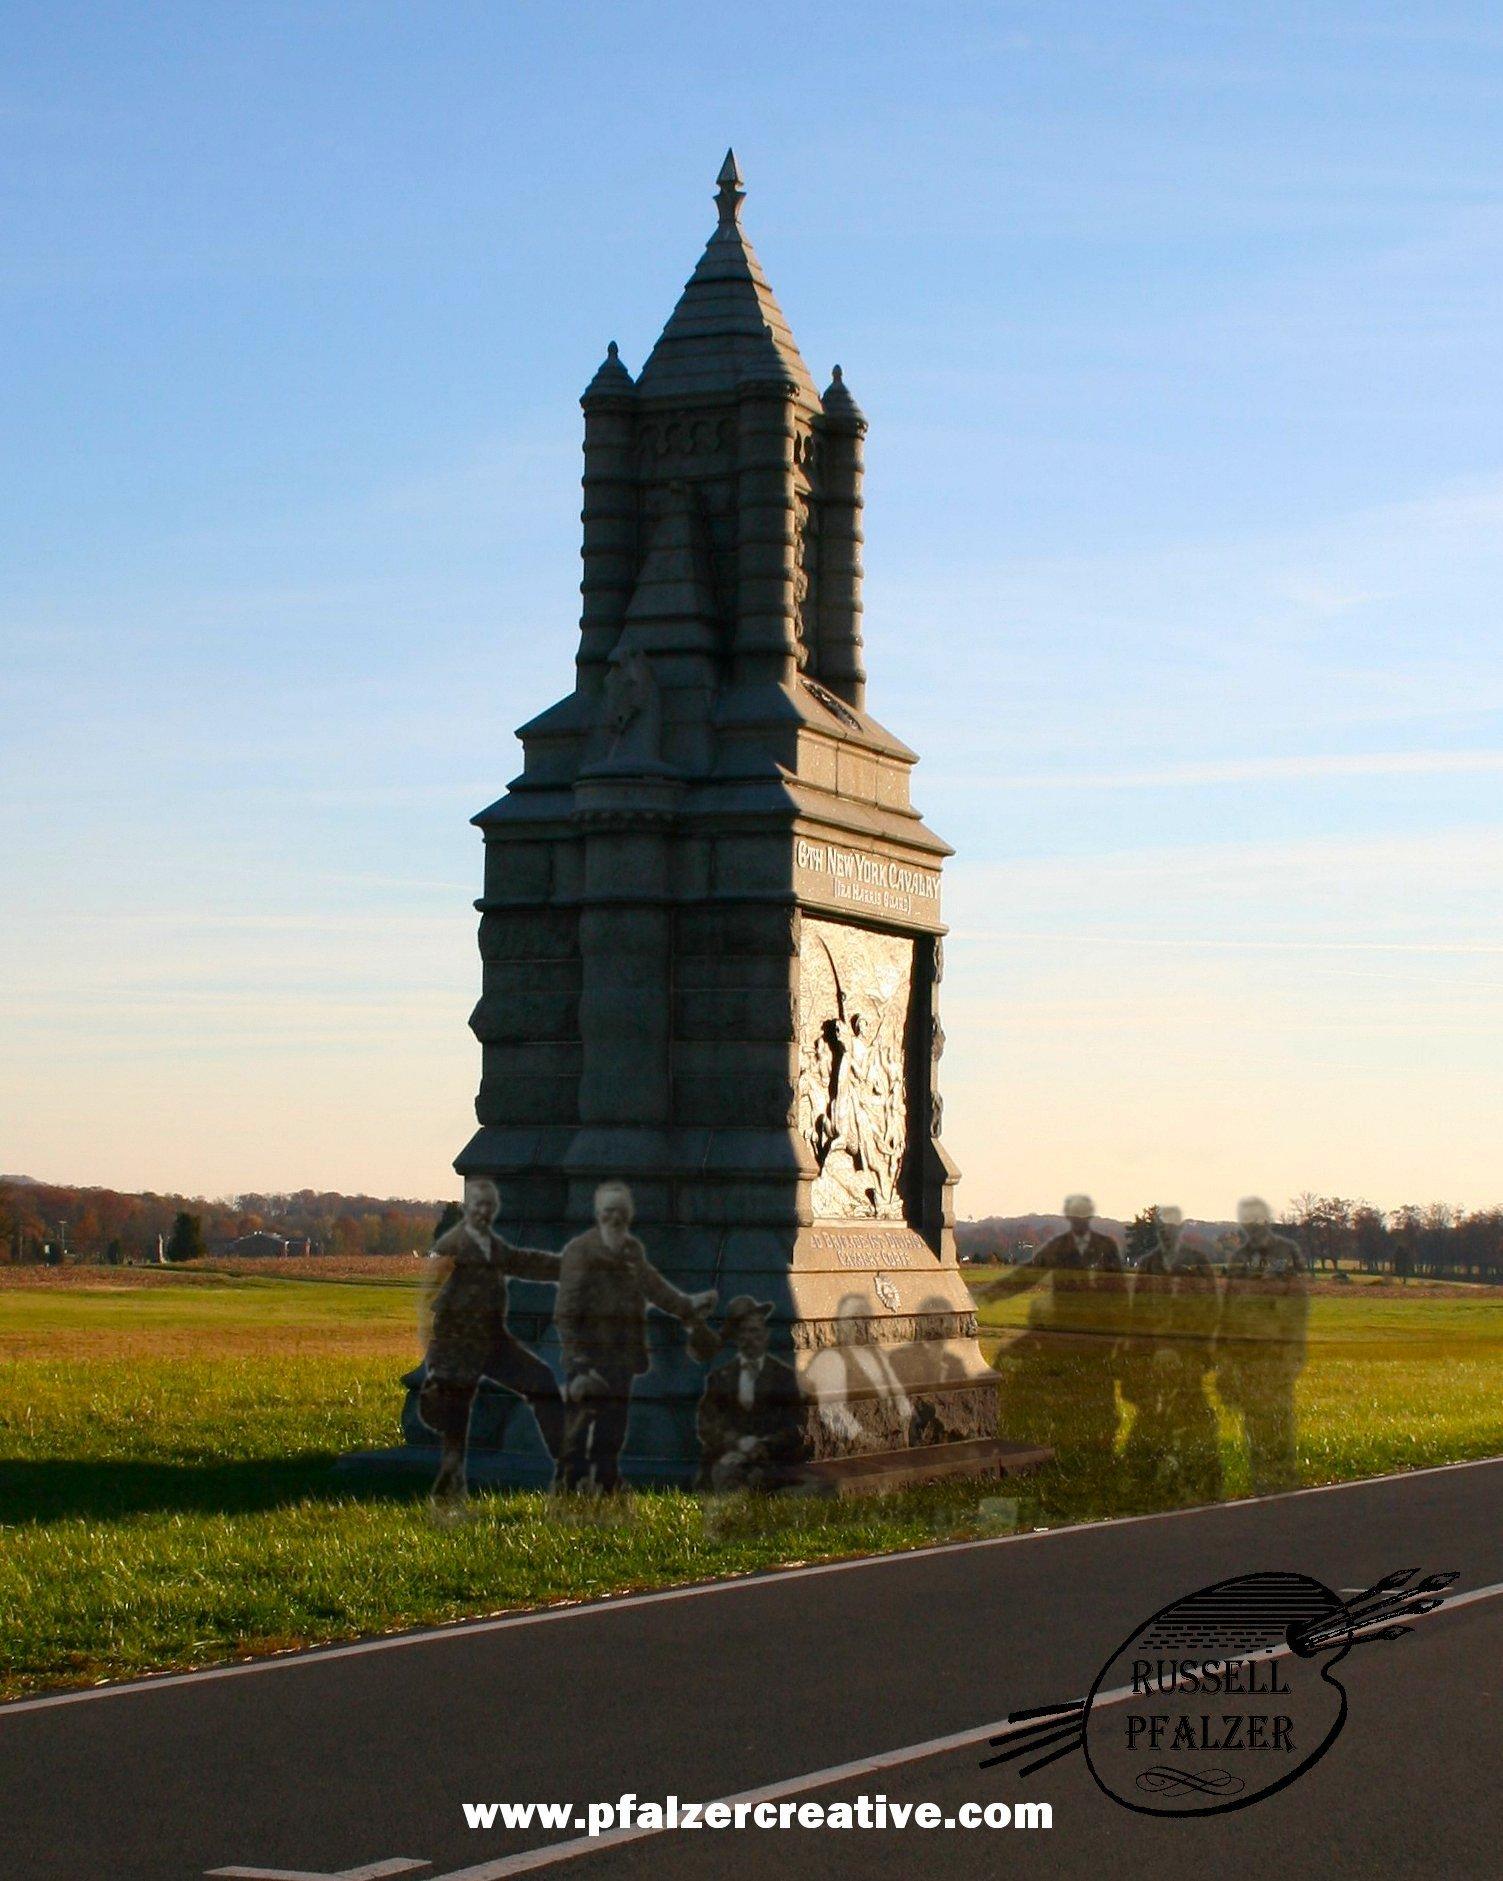 6th New York Cavalry Day One Battlefield, Gettysburg